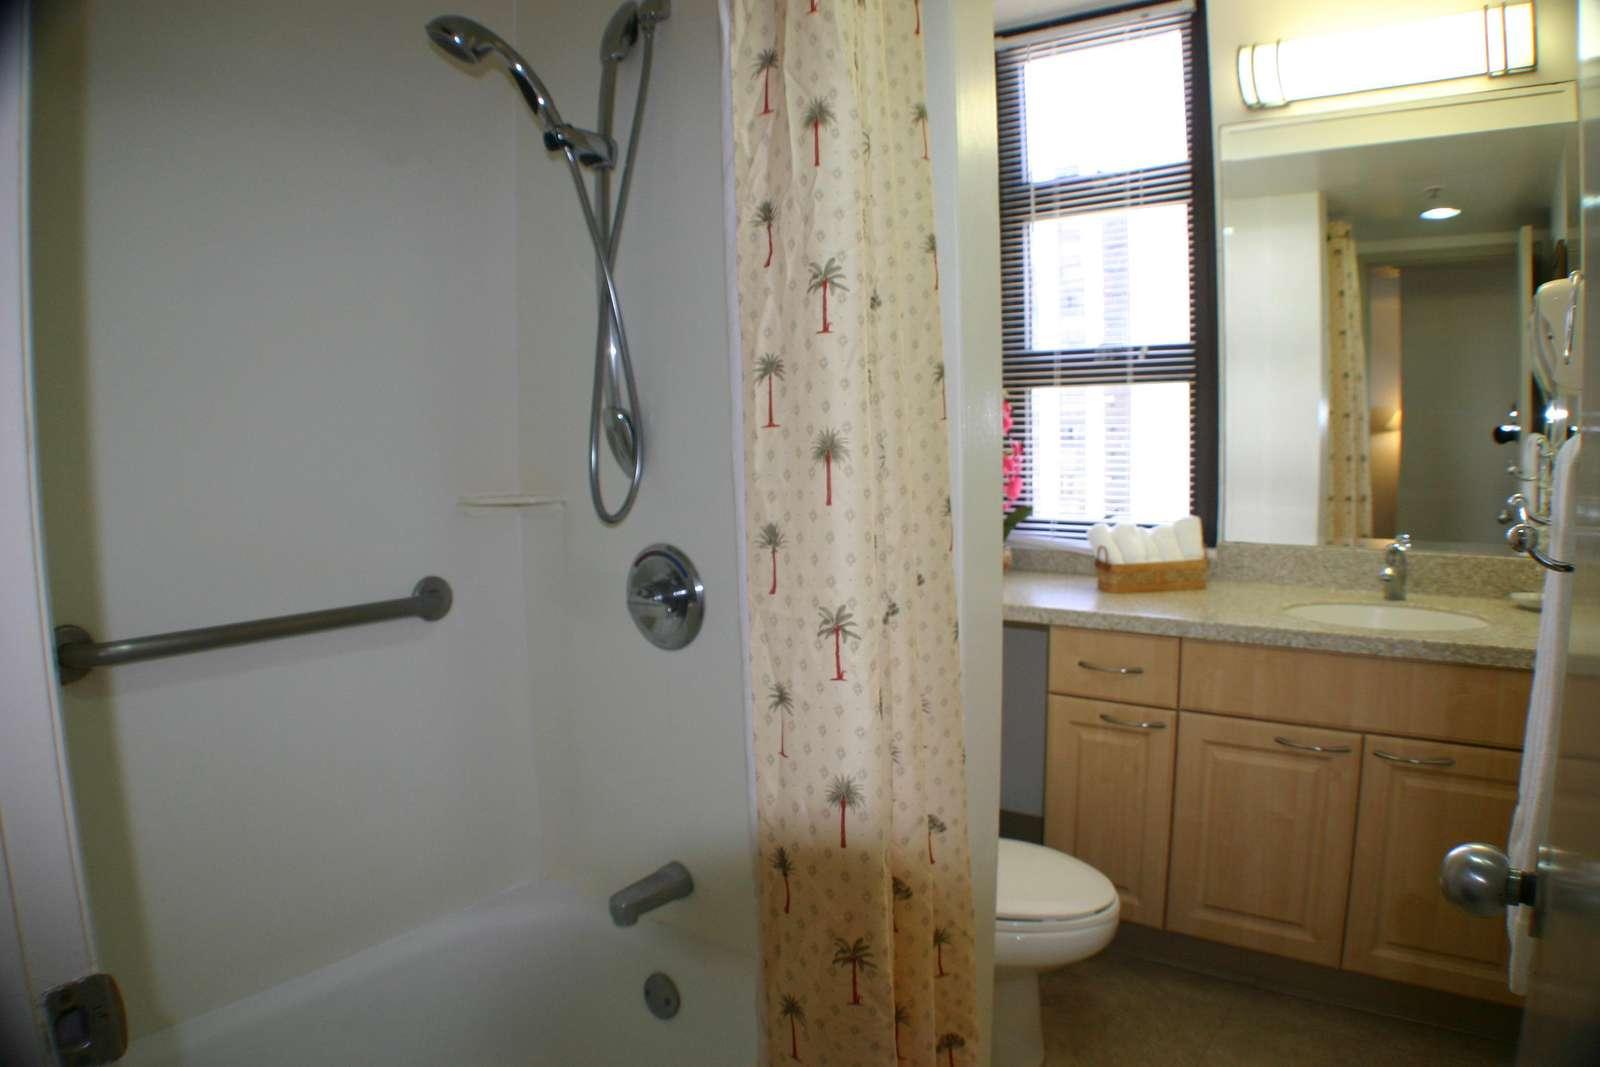 Tub/Shower with Grab Bars